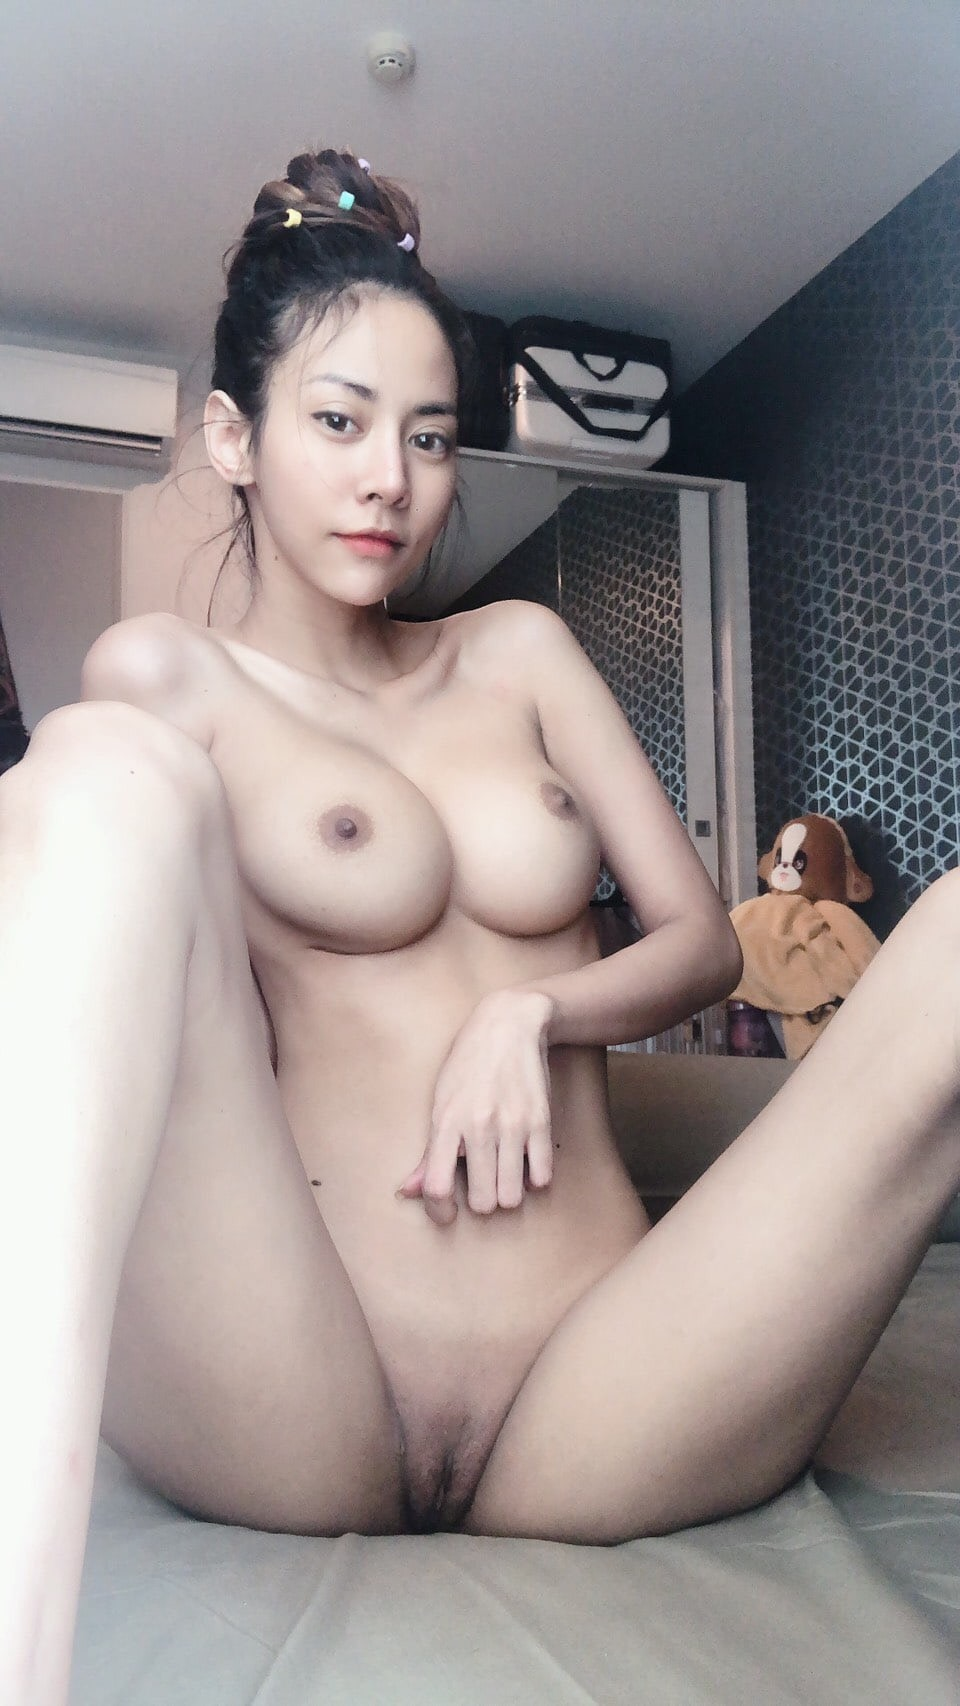 F546H9lW NI - Beauty nude girl big tits sexy pussy 2020